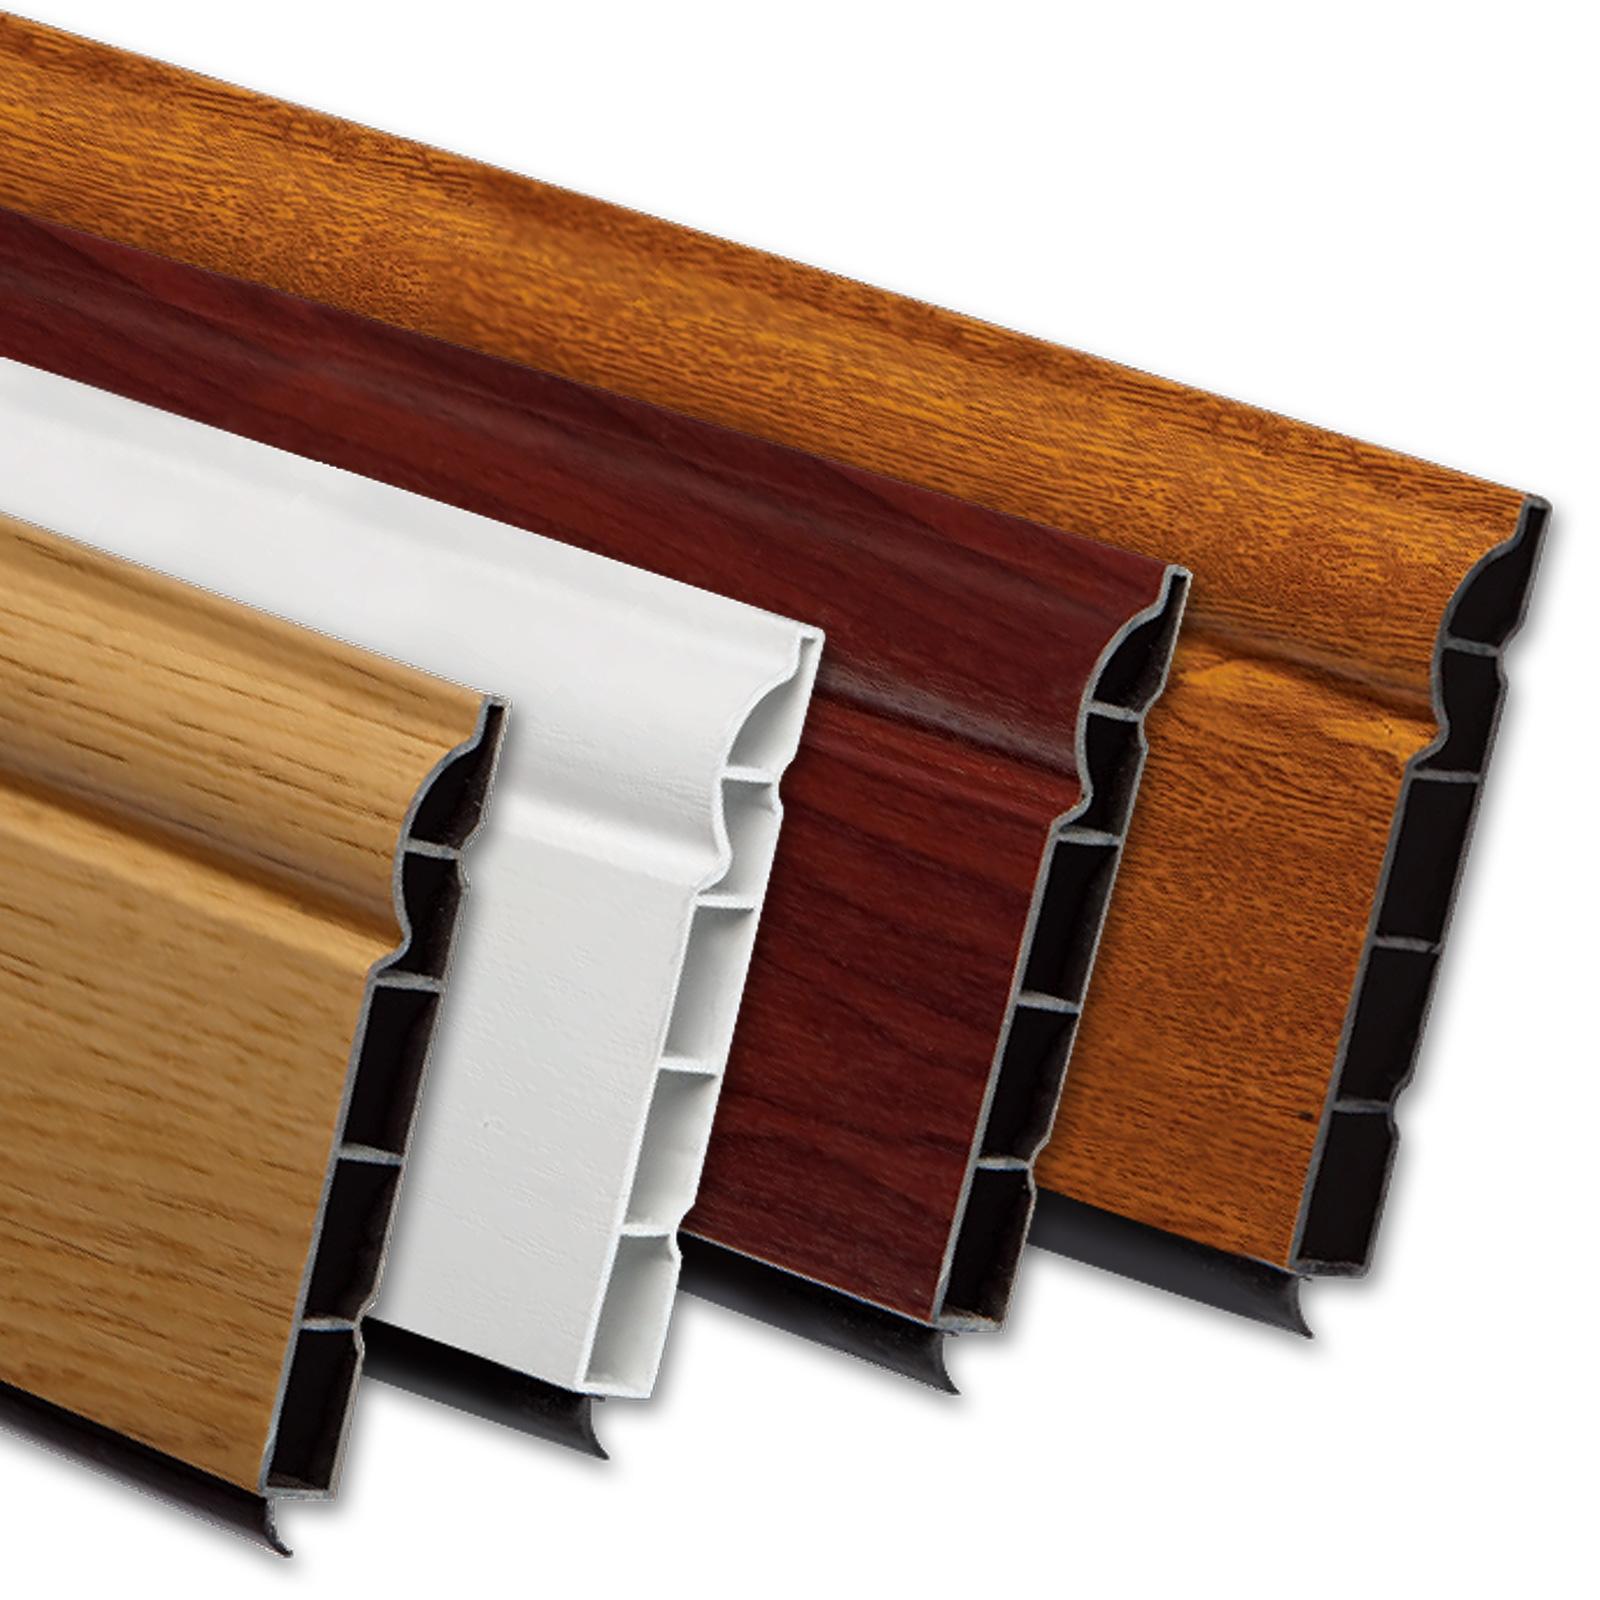 2 5m Roomline Pvcu Plastic Skirting Board Woodgrained